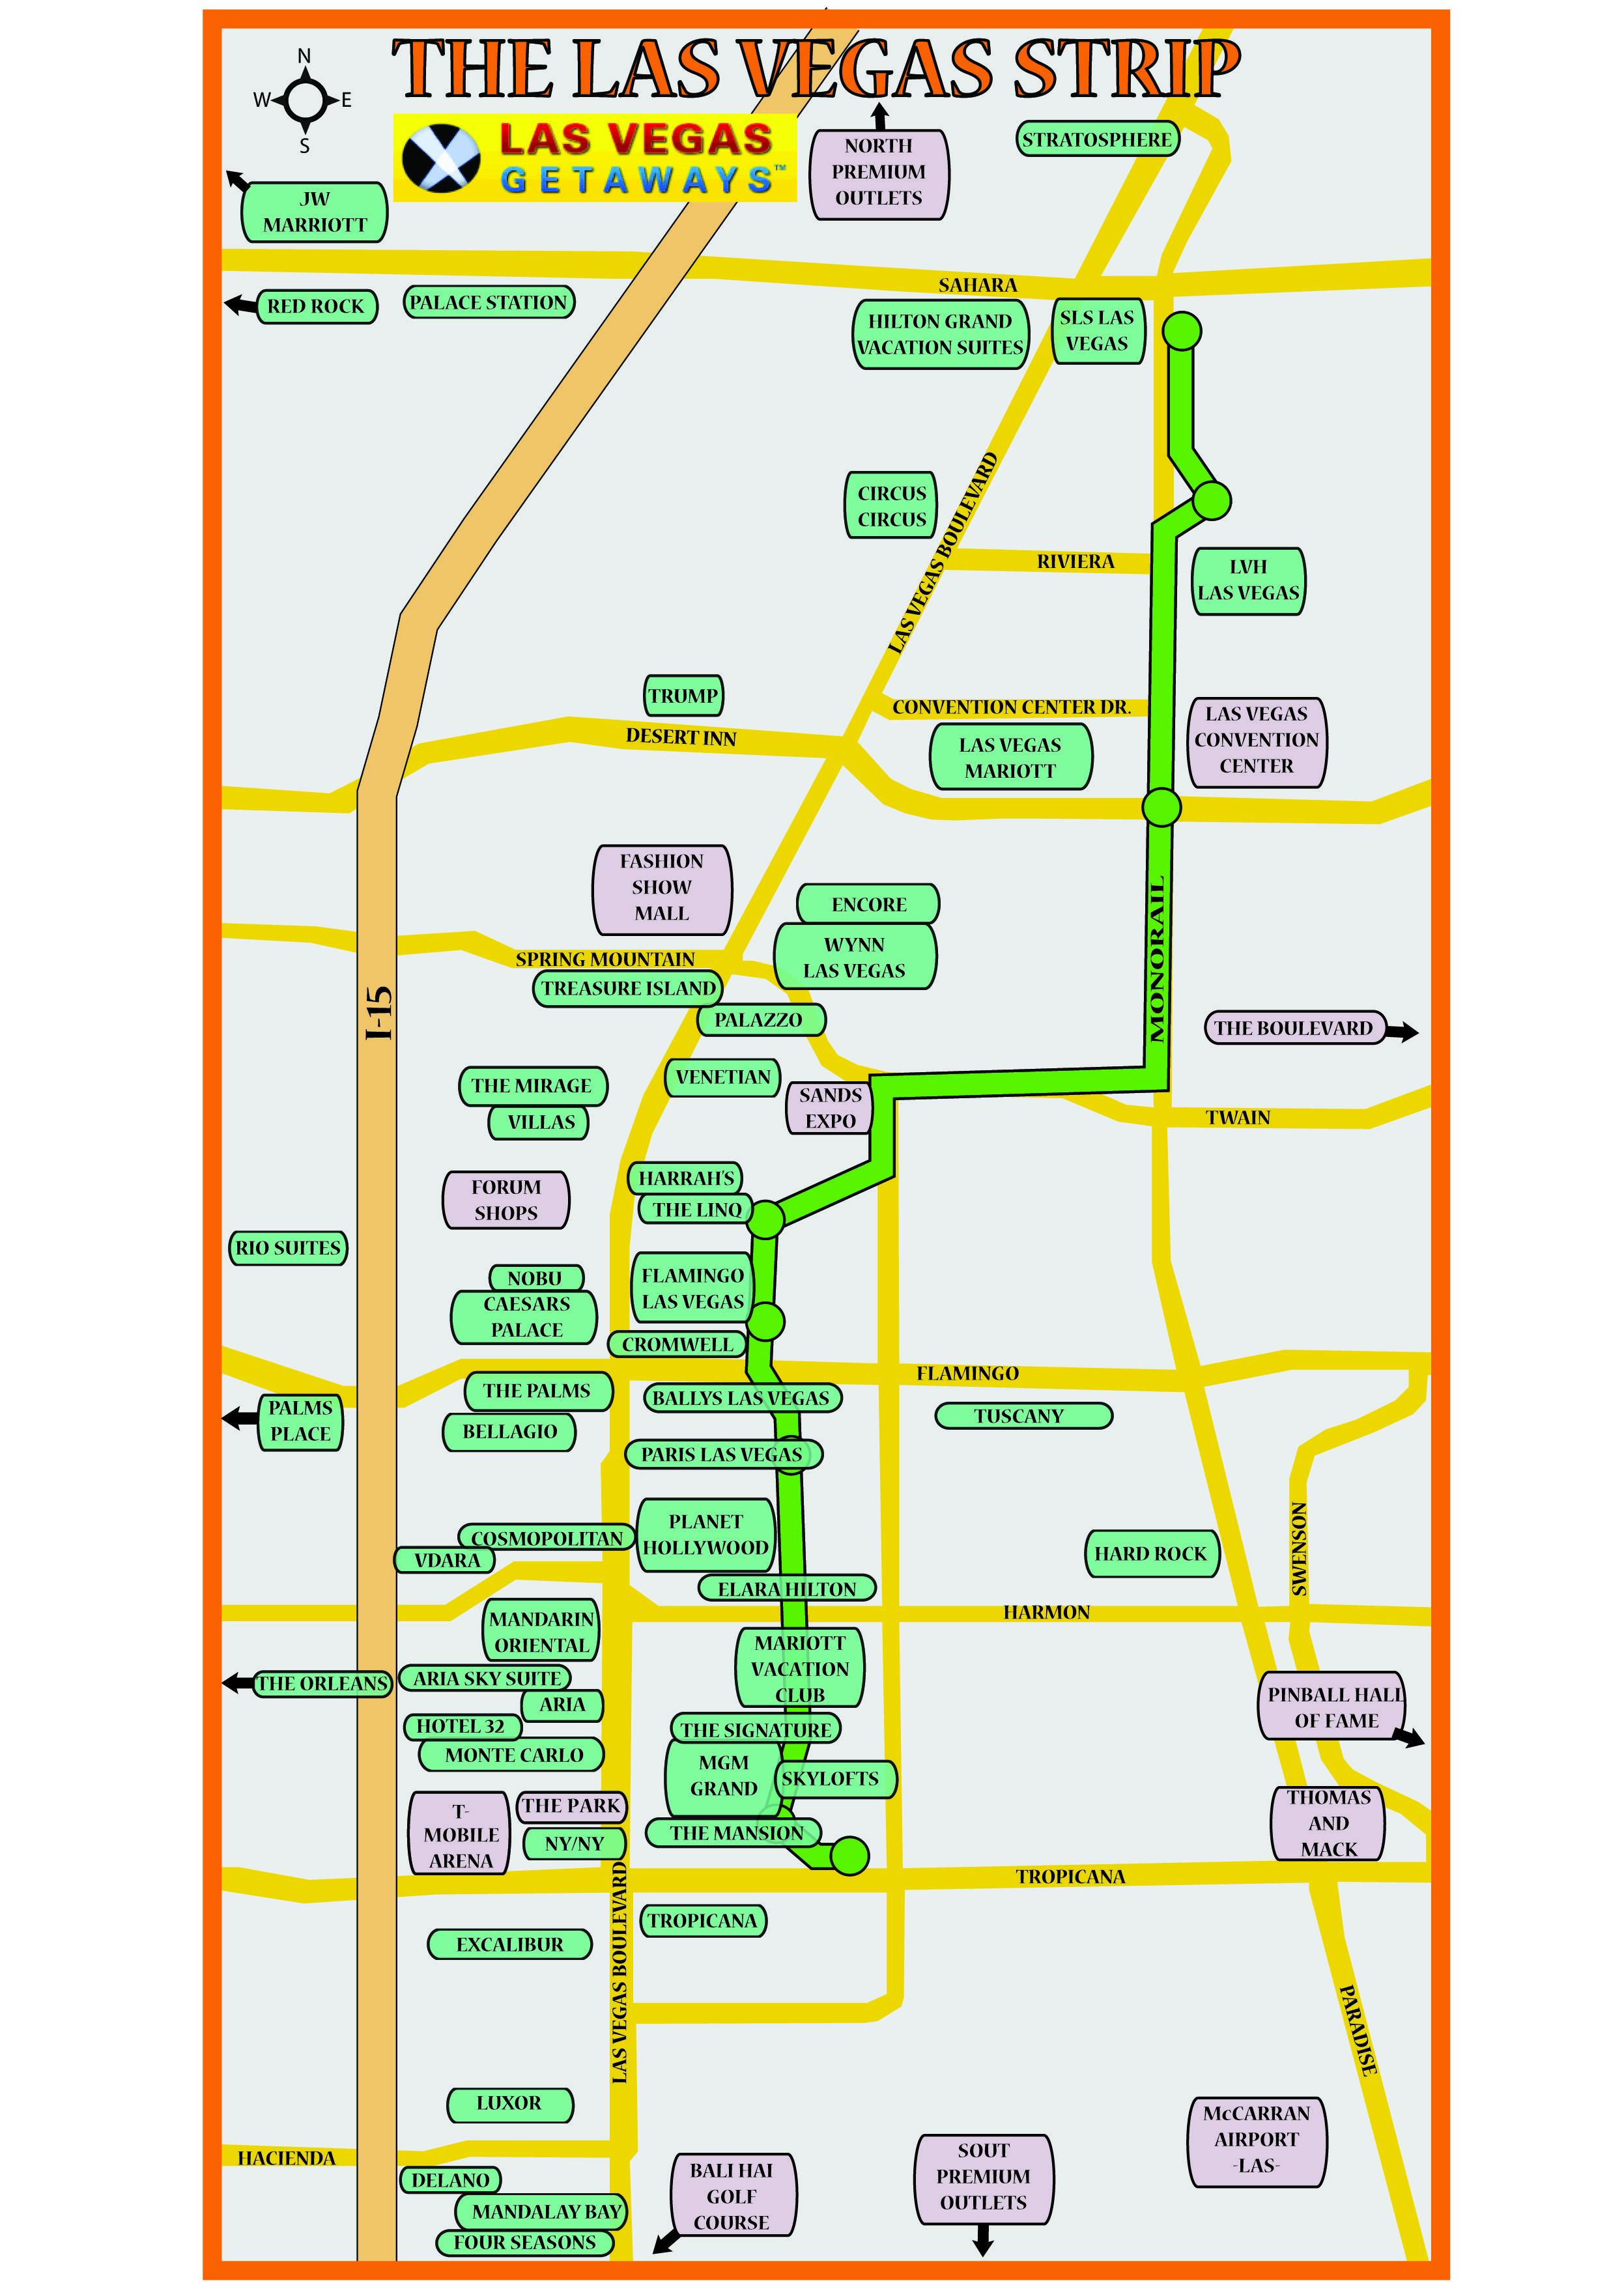 The Park Las Vegas Map.Las Vegas Strip Map Las Vegas Getaways Vegas Getaway Las Vegas